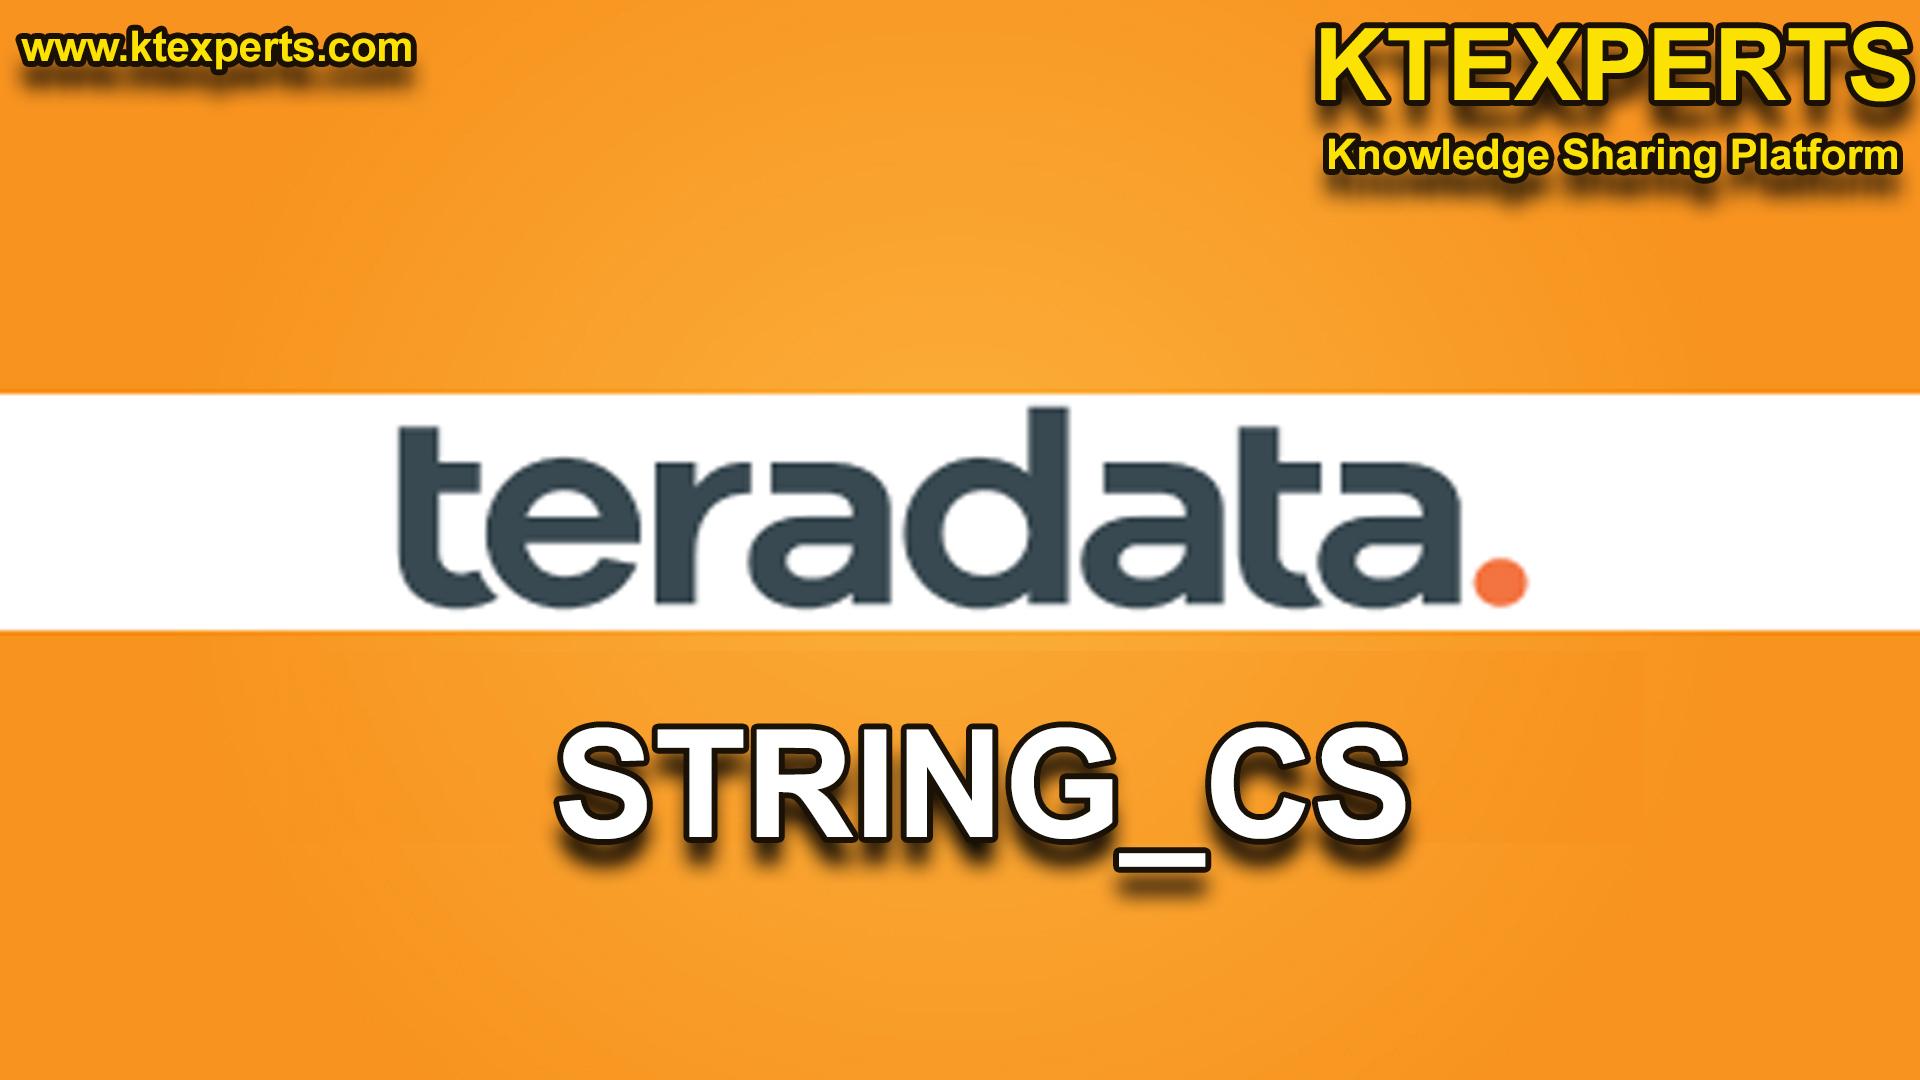 STRING_CS FUNCTION IN TERADATA